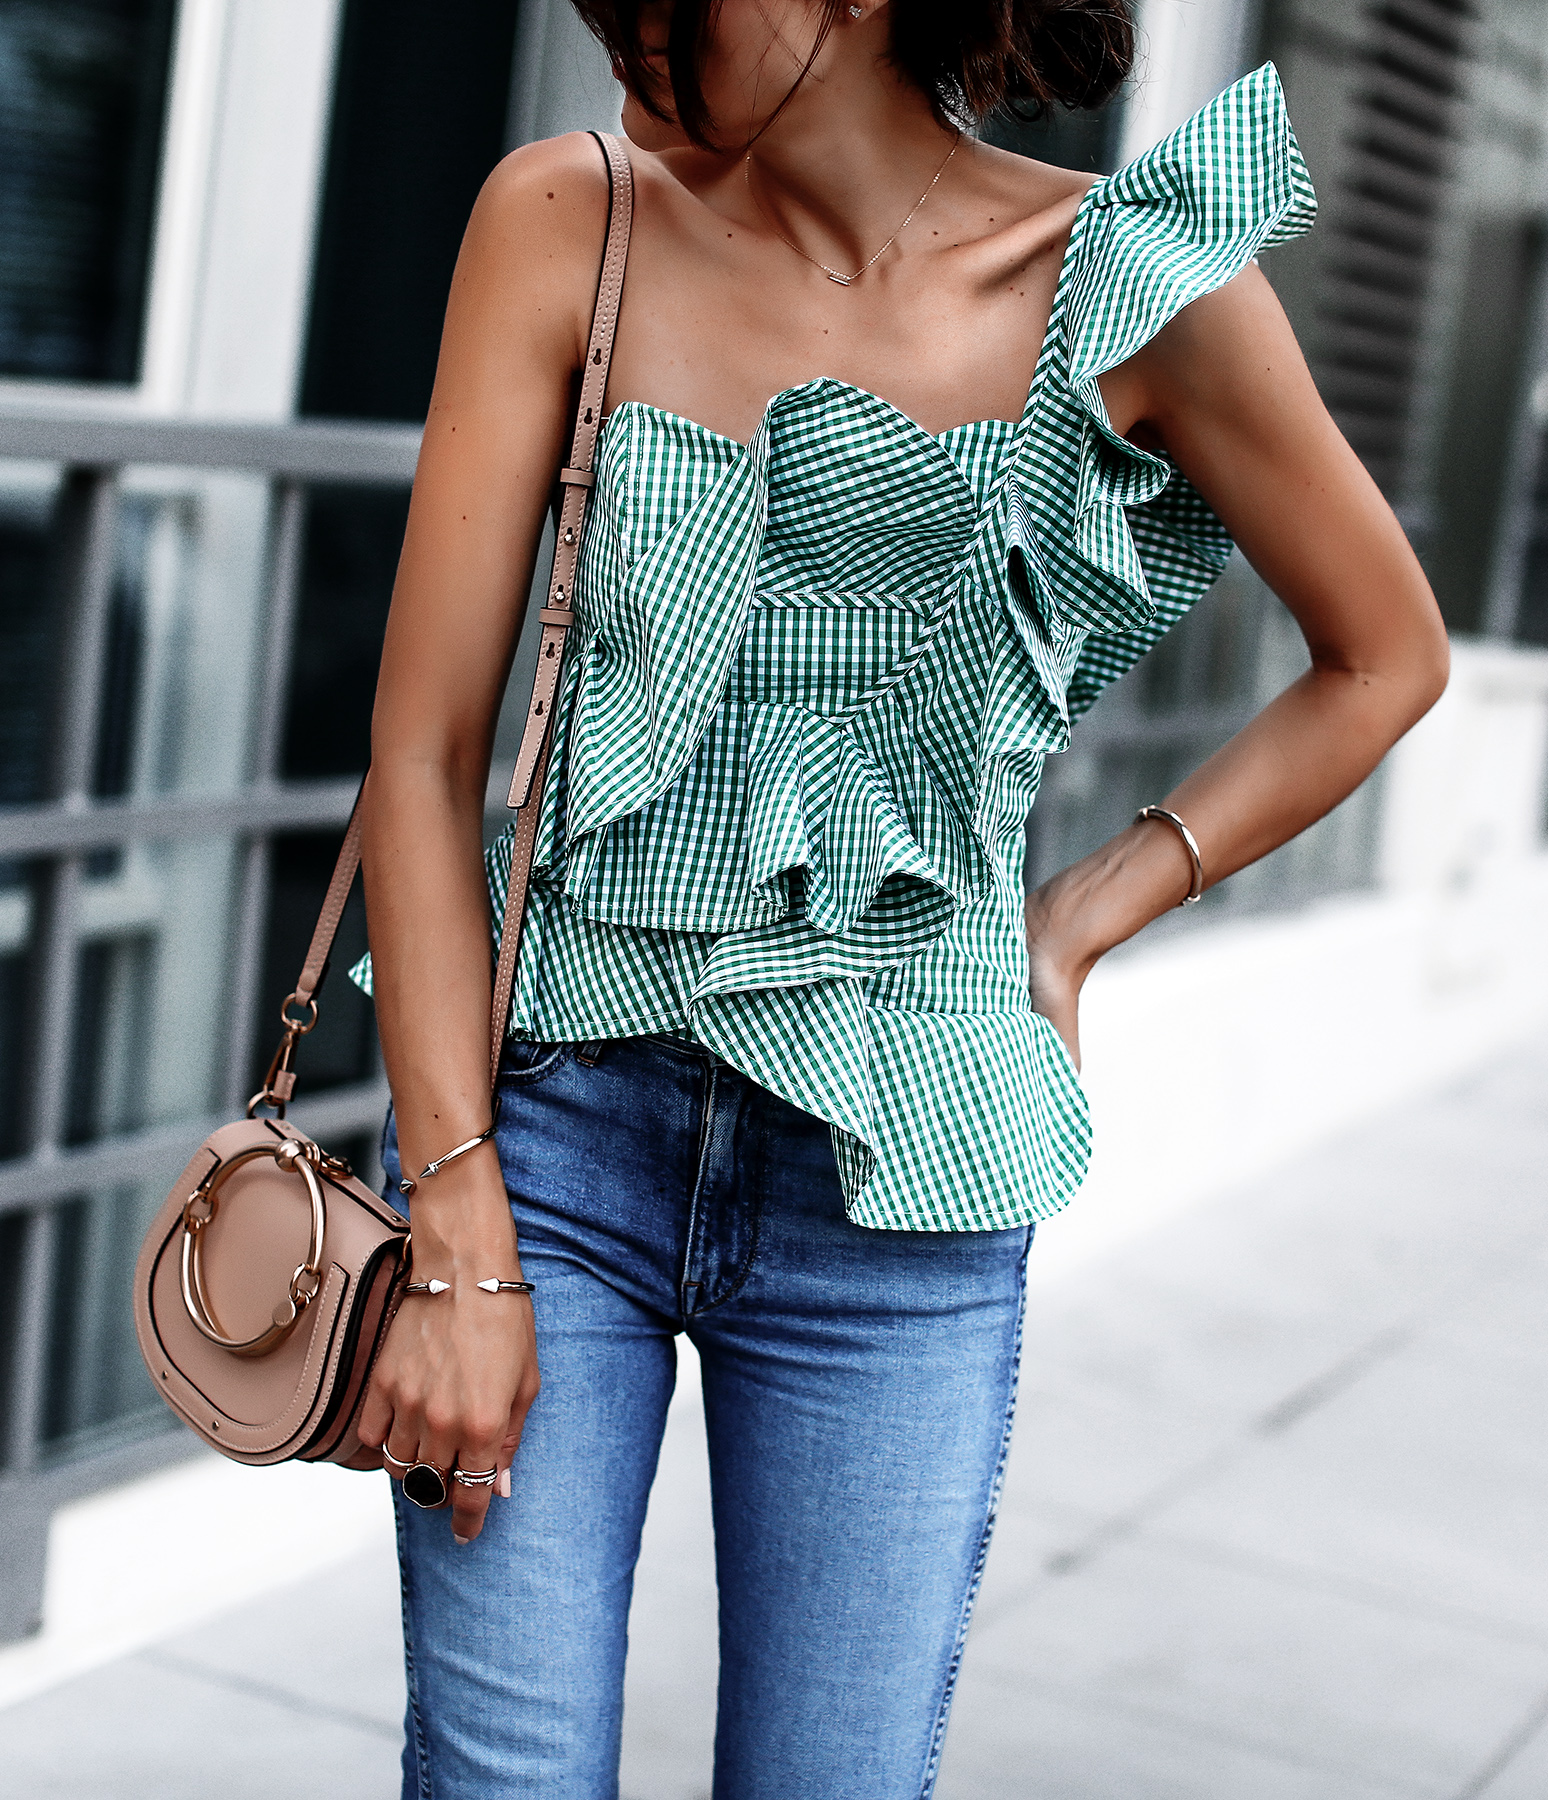 Stylekeepers Ruffled Bustier Top 3x1 Denim Chloe Nile Bag Christian Louboutin White Pumps.jpg